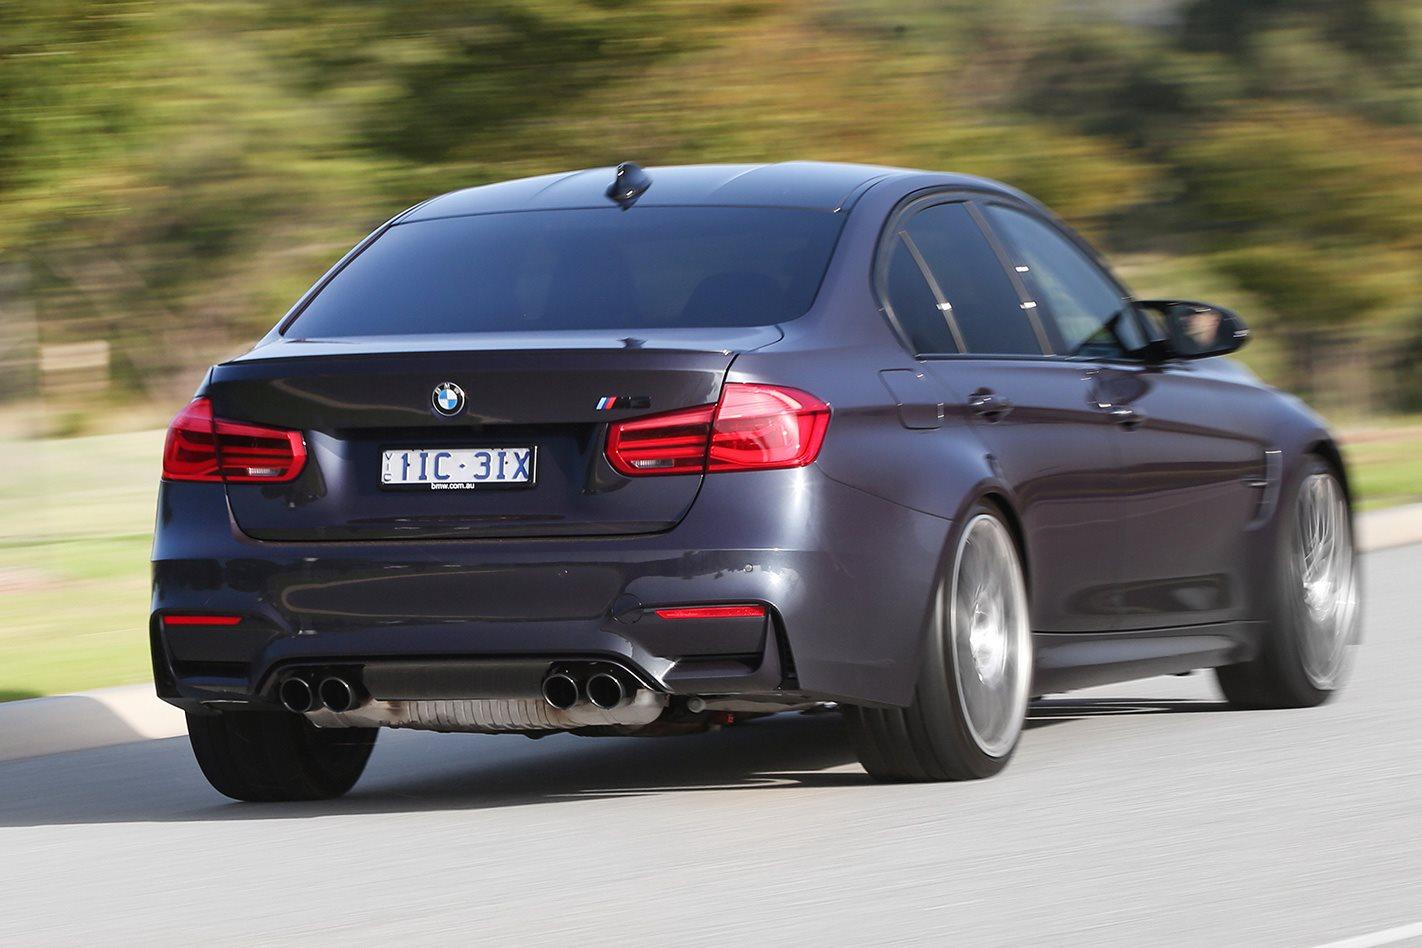 BMW-F80-M3-30-Jahre-driving-rear.jpg